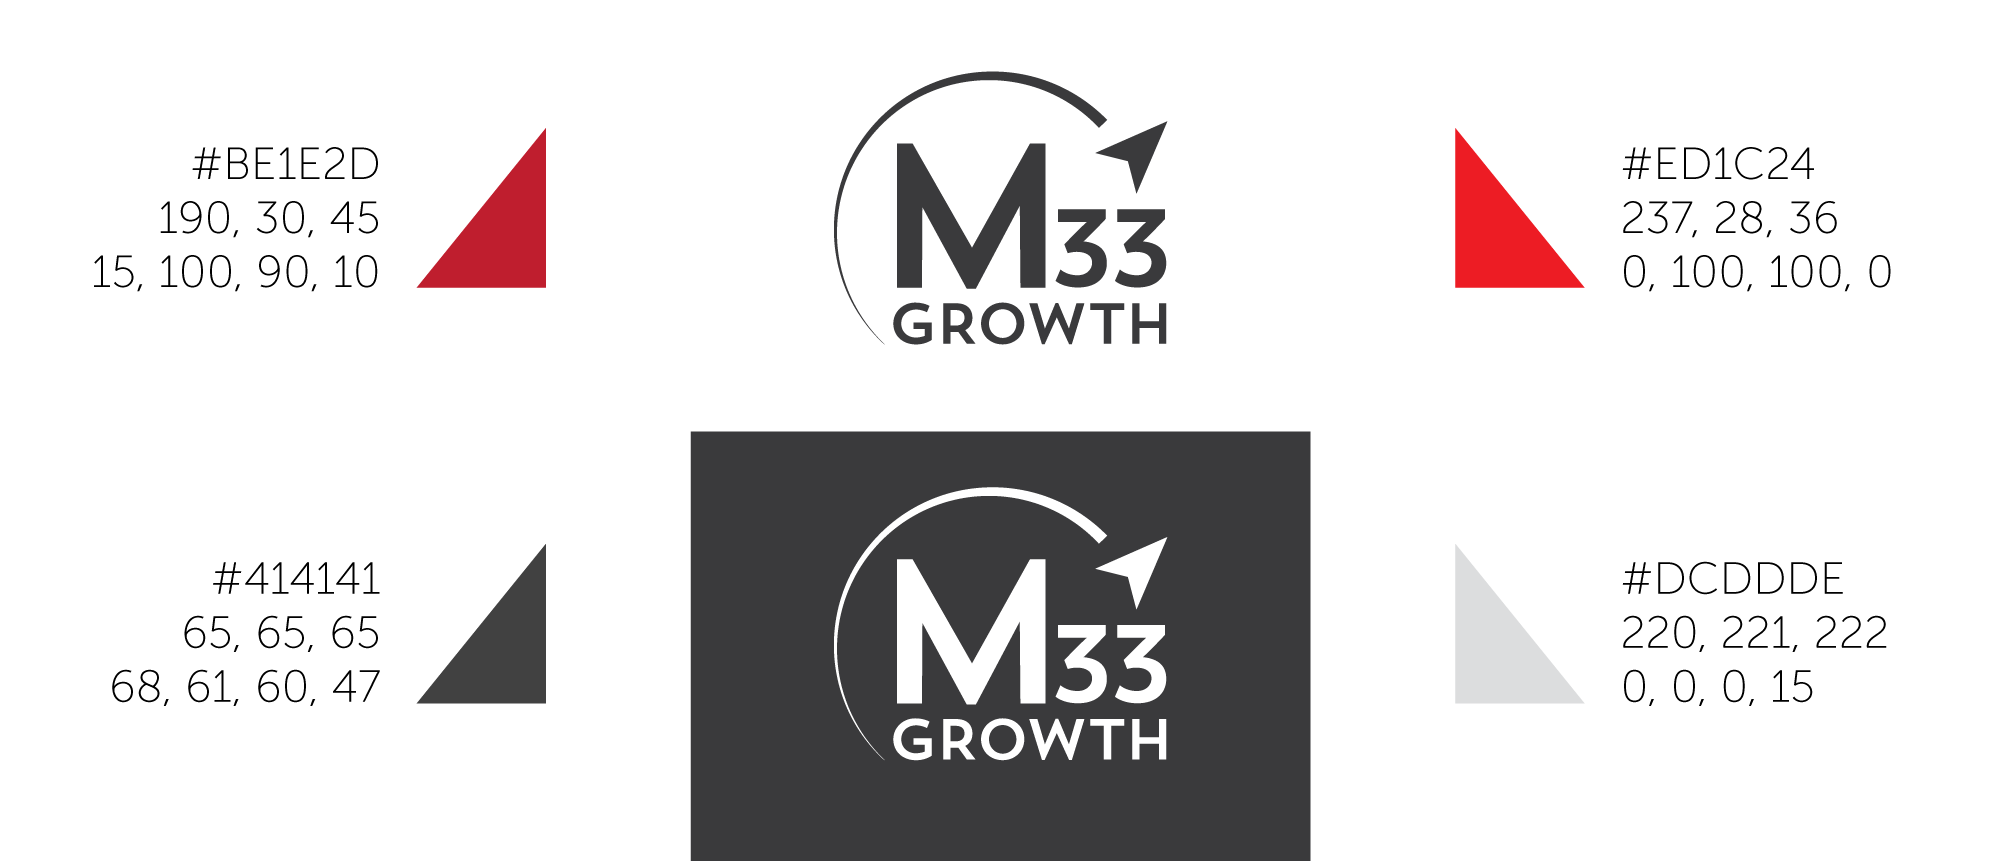 M33 Growth logo variations